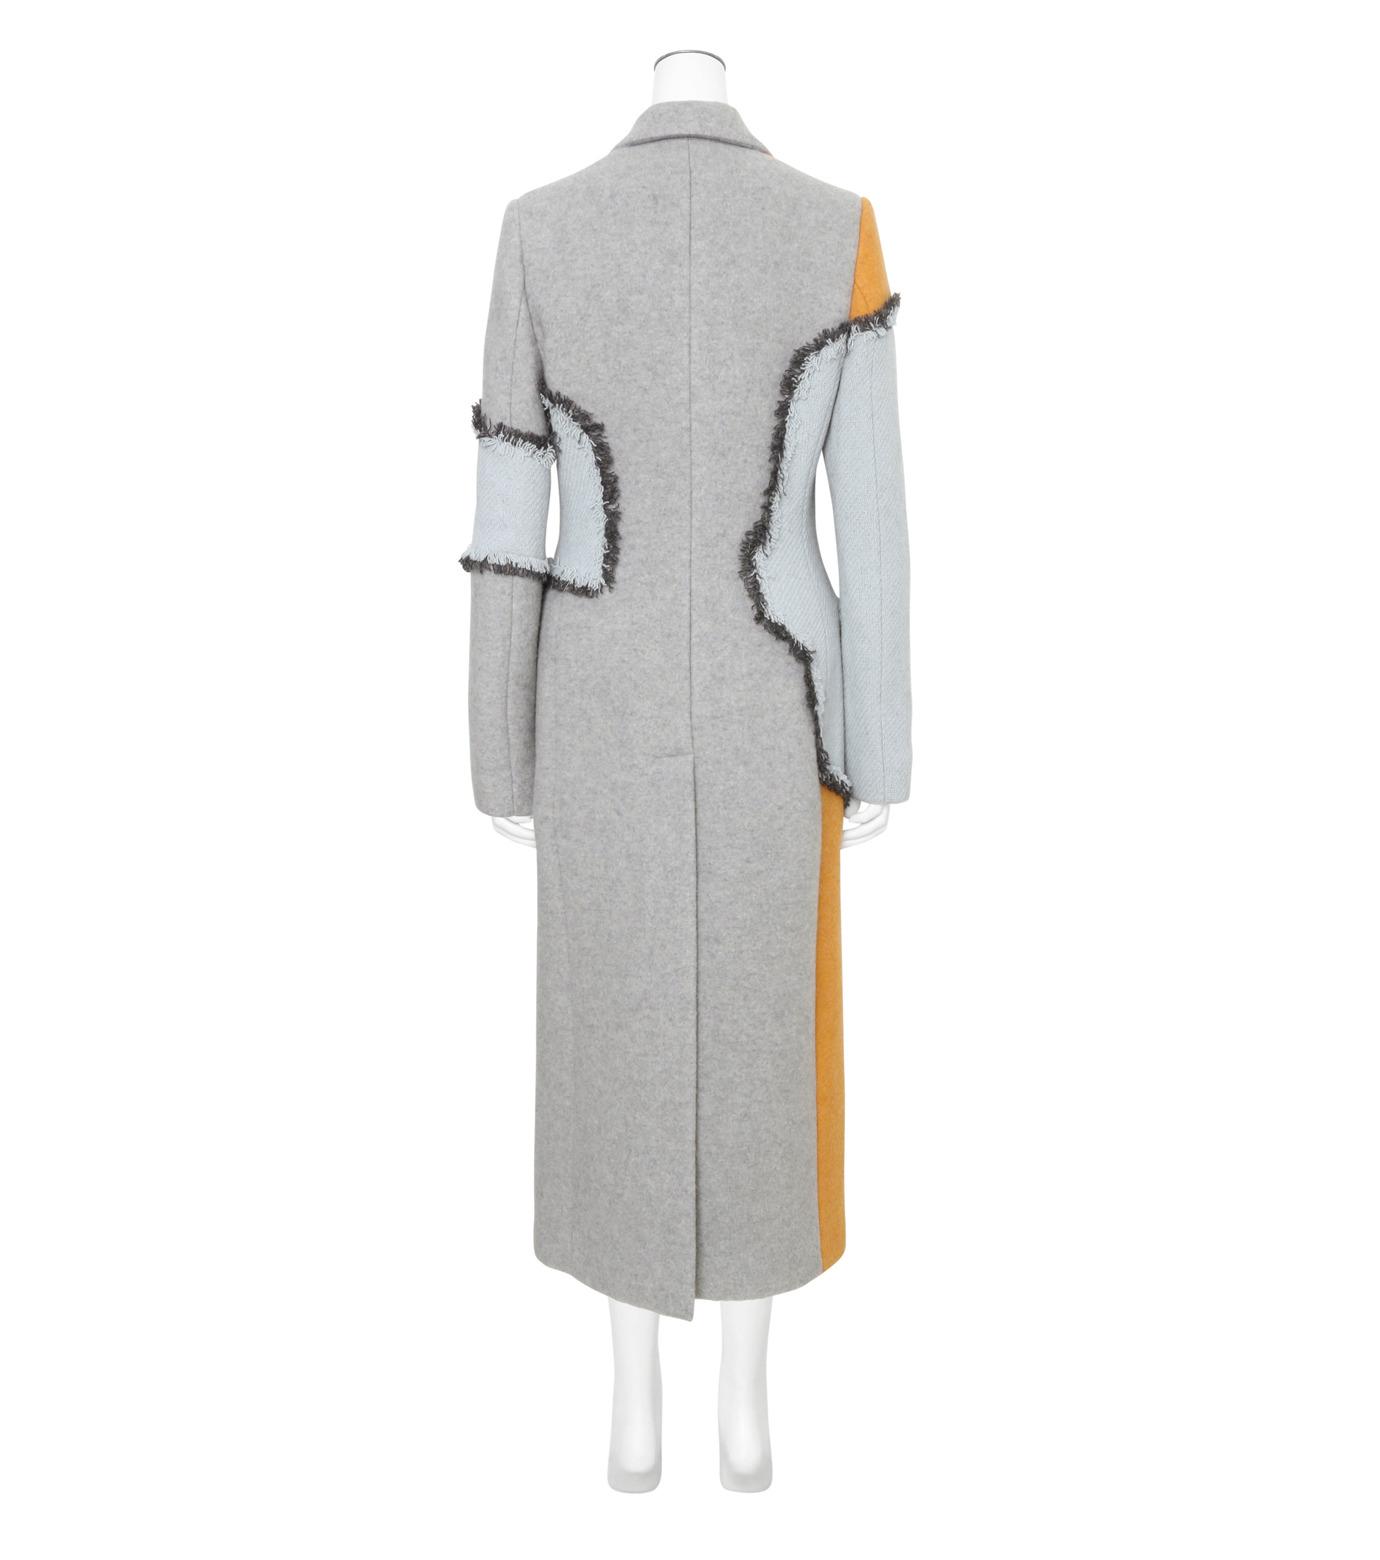 ACNE STUDIOS(アクネ ストゥディオズ)のPatchwork Fitted Coat-GRAY(コート/coat)-12BC63-11 拡大詳細画像2